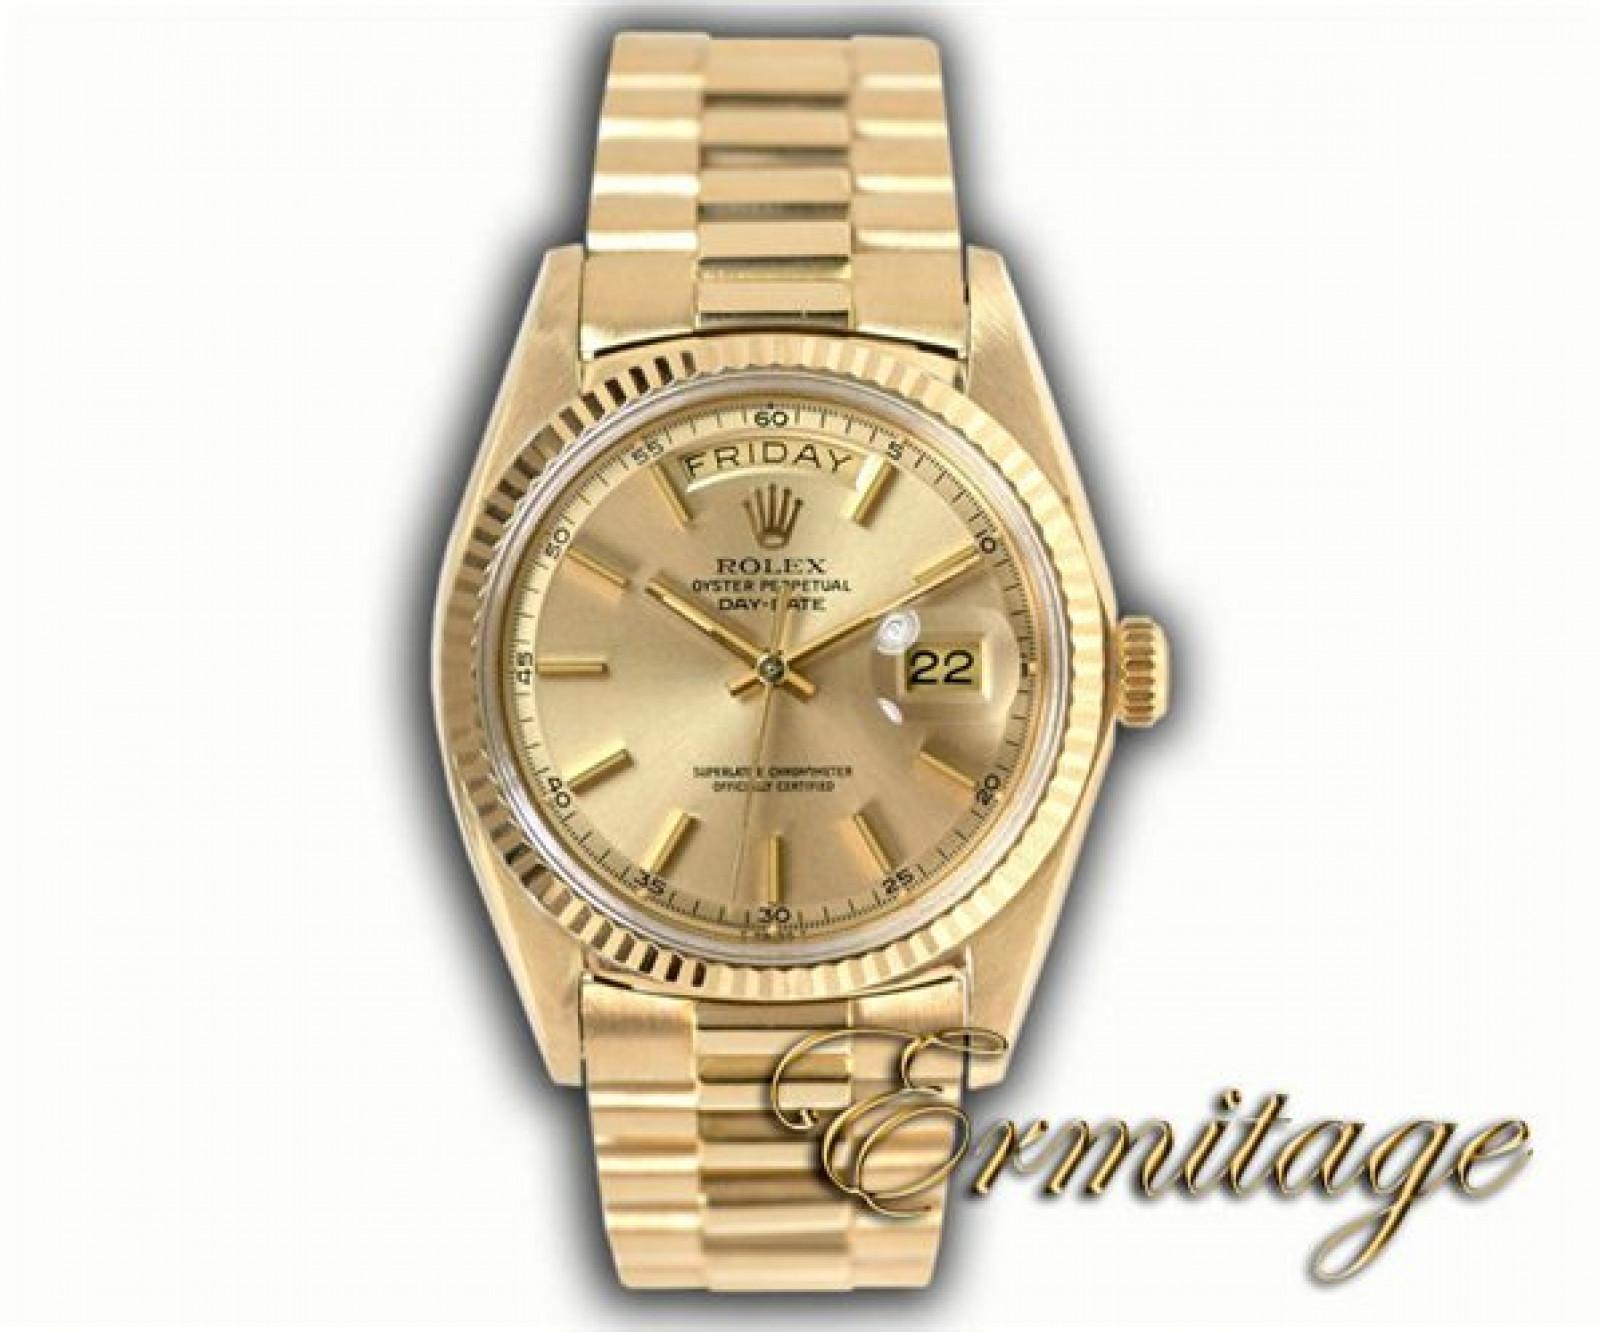 Vintage Rolex Day-Date 1803 Gold Year 1972 1972